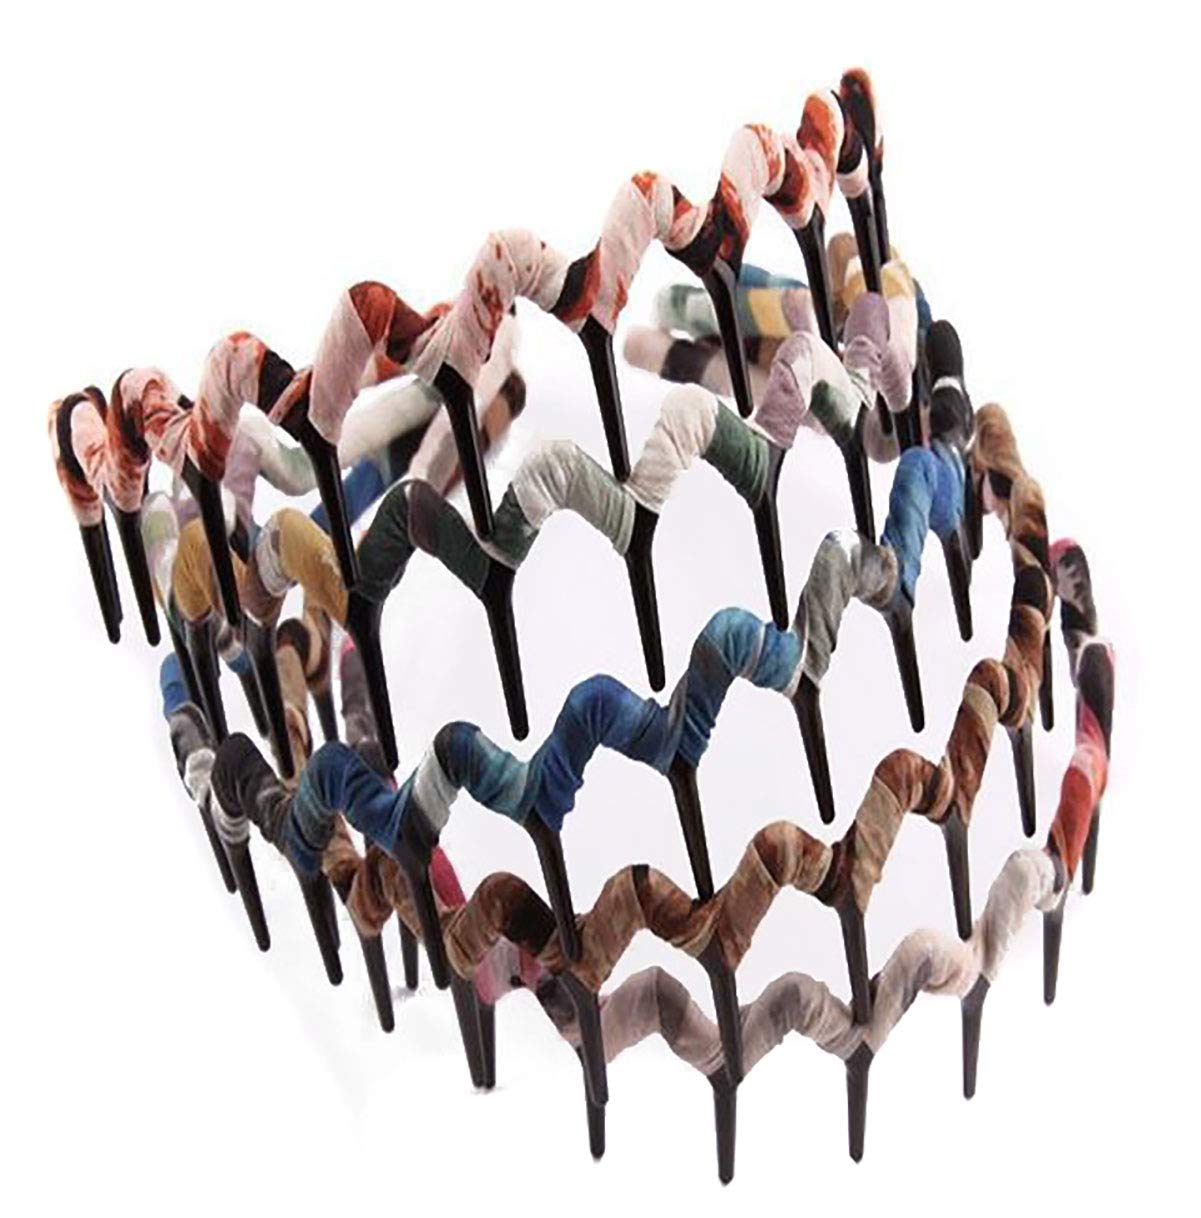 Fodattm 5PCS Bohemia Style Shark Tooth Wrapped Cloth Hairband Plastic Teeth Comb Hair Hoop Headband